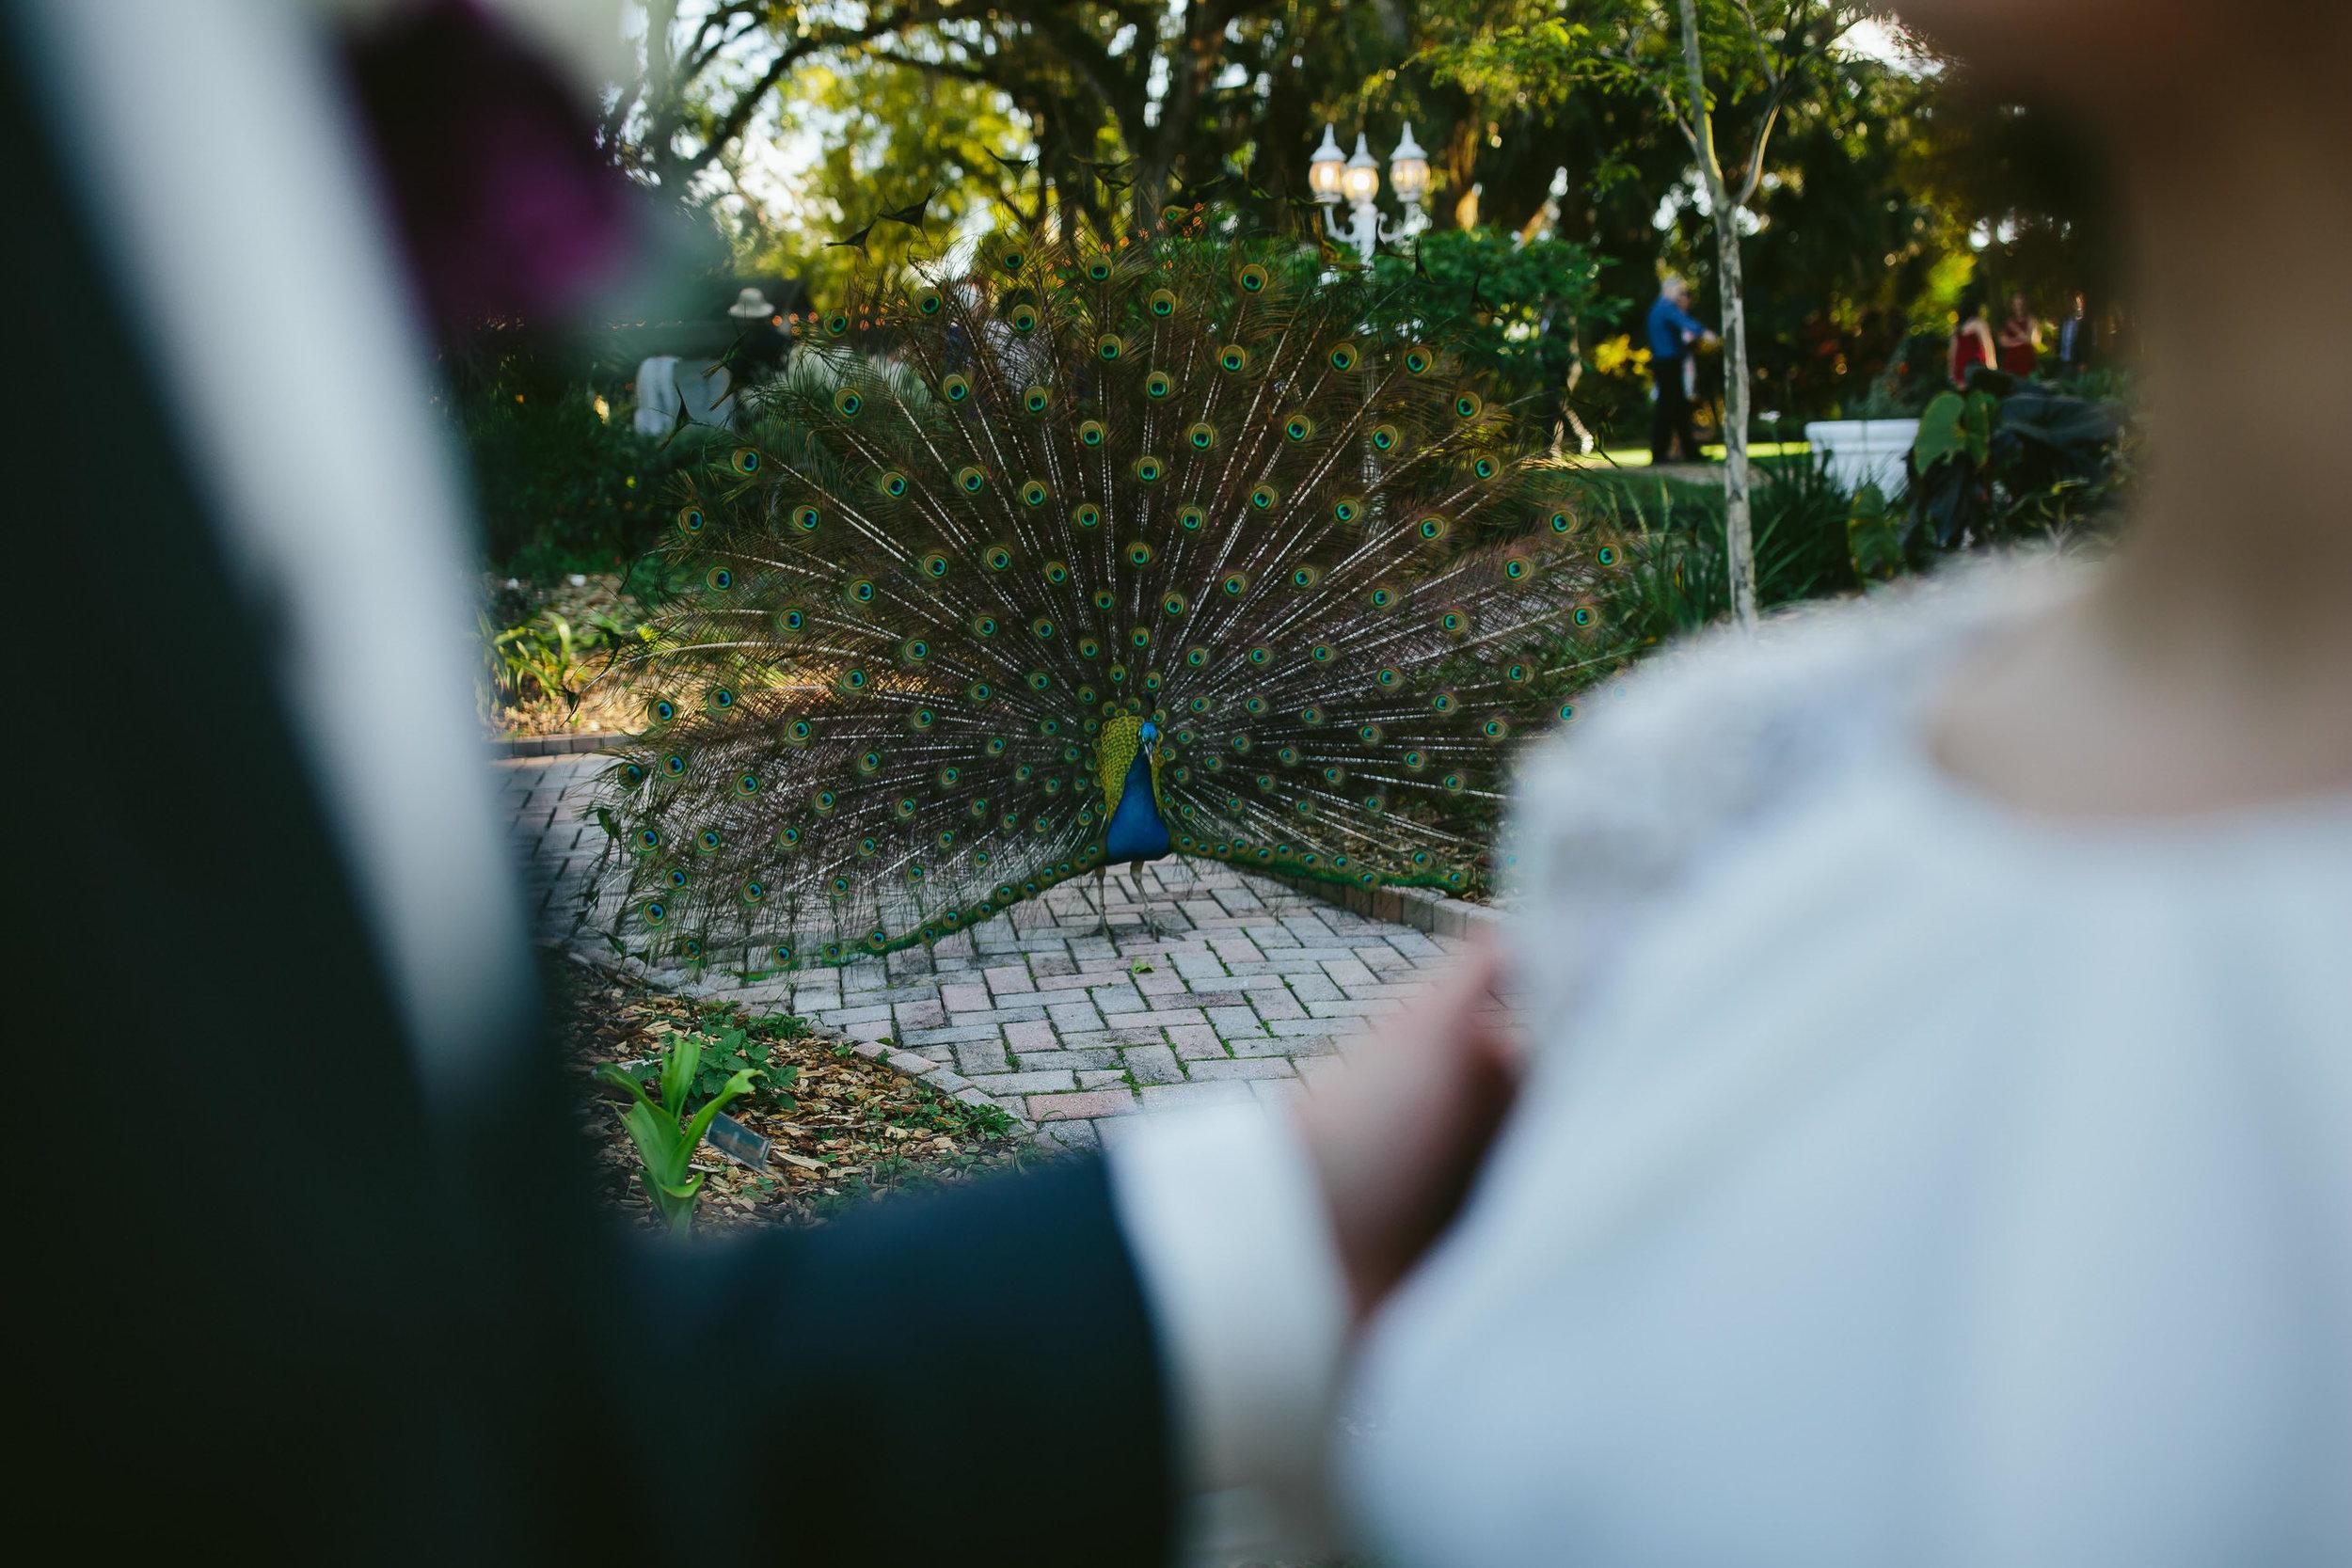 wedding-couple-adventures-peacock-animals-farm-wedding-tiny-house-photo.jpg